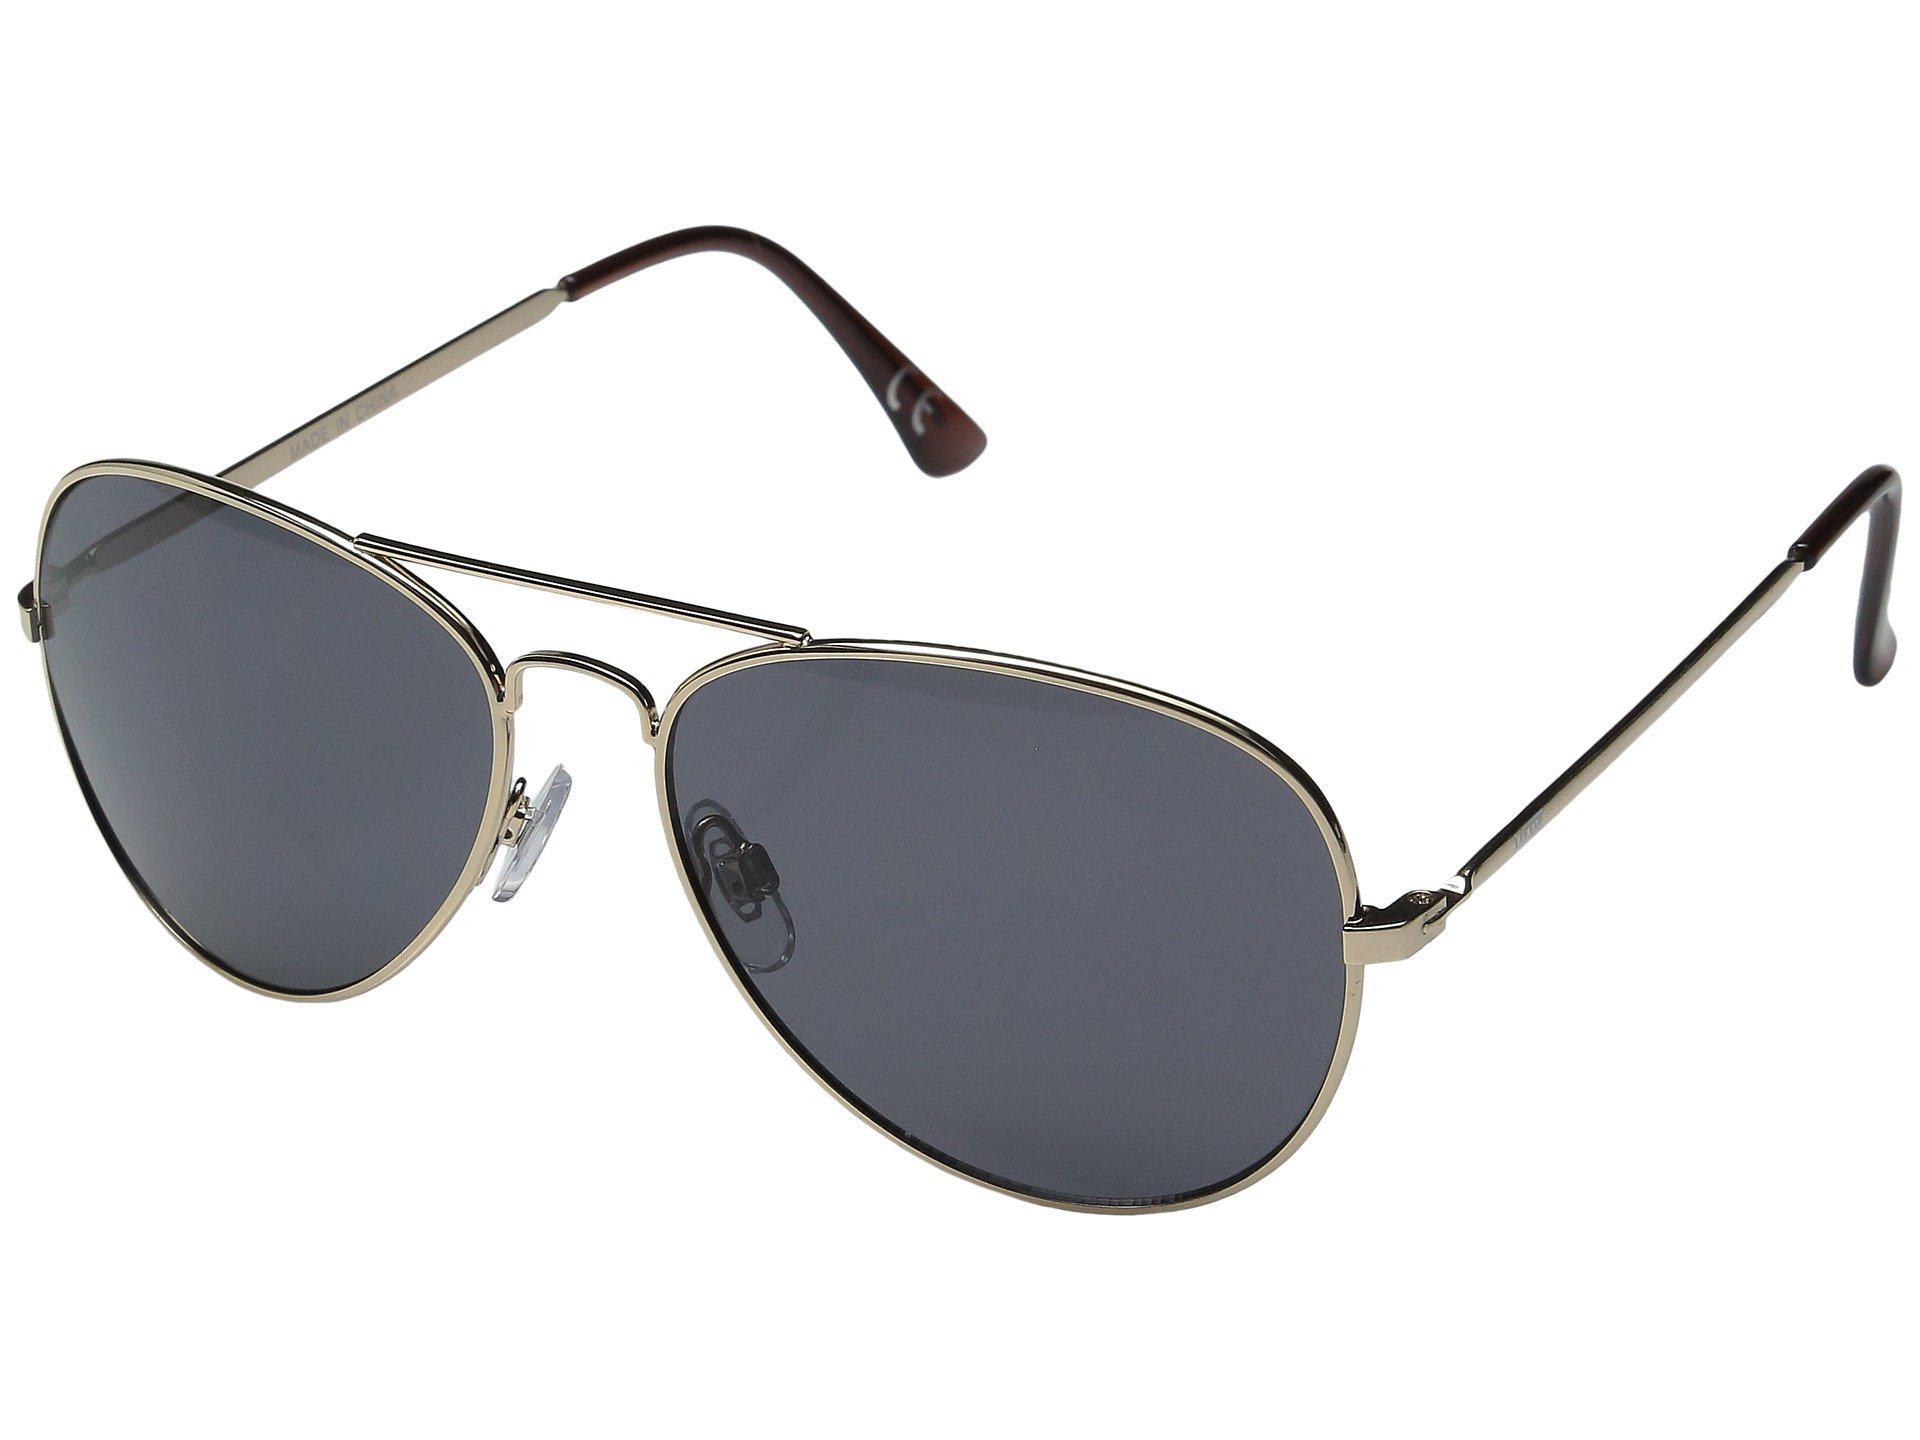 8bac8d4912 Vans. Men s Metallic Fly South Sunglasses (gold) Fashion Sunglasses